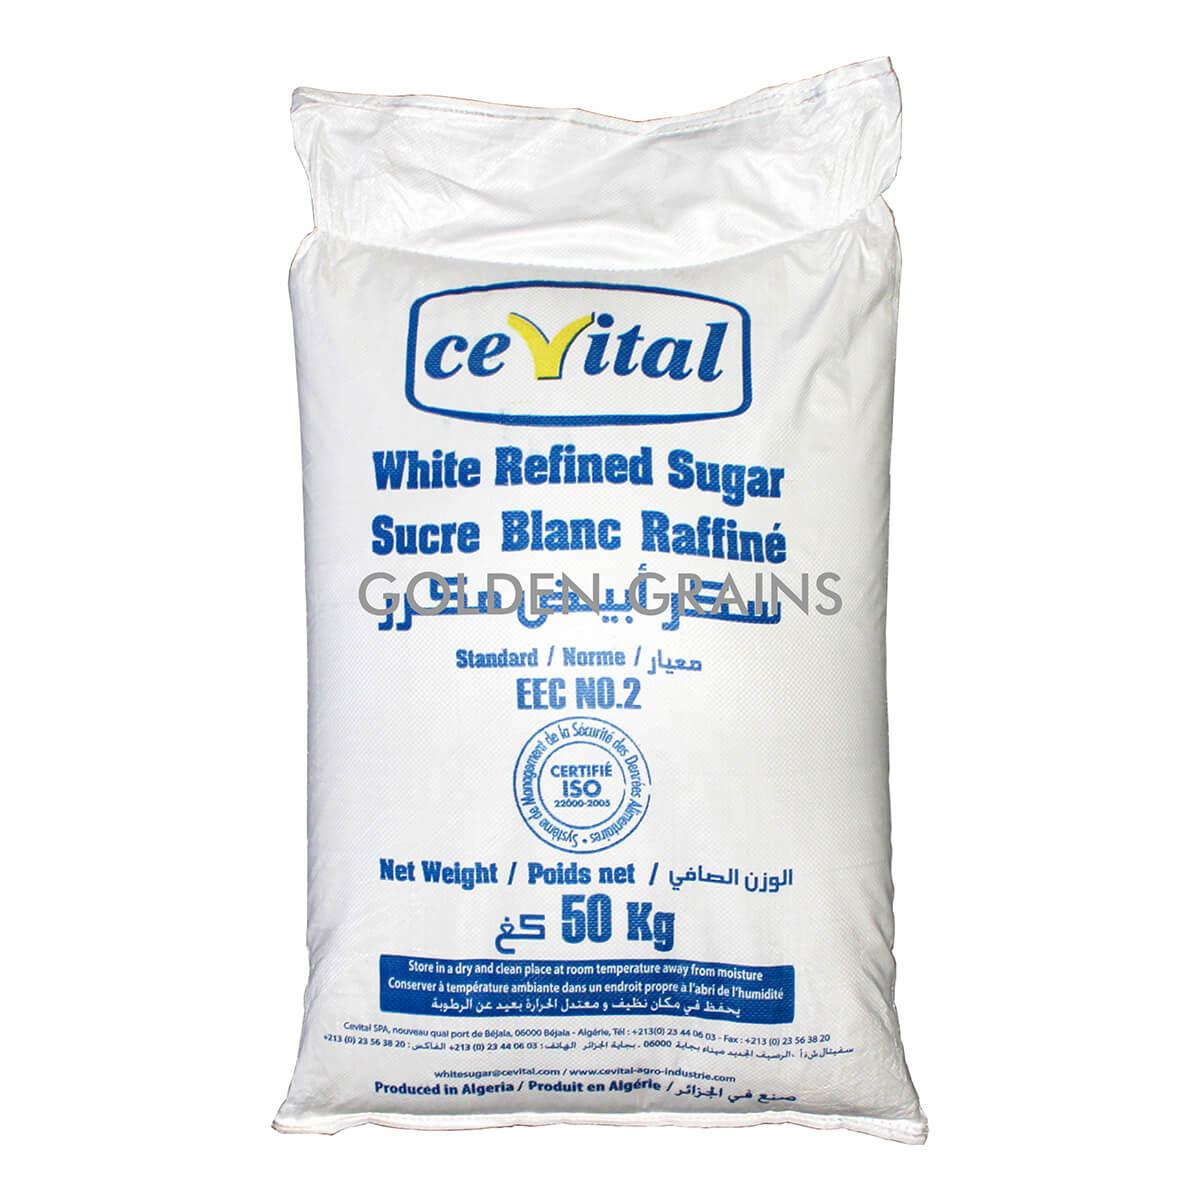 Golden Grains - Cevital - Sugar Bag - Front.jpg